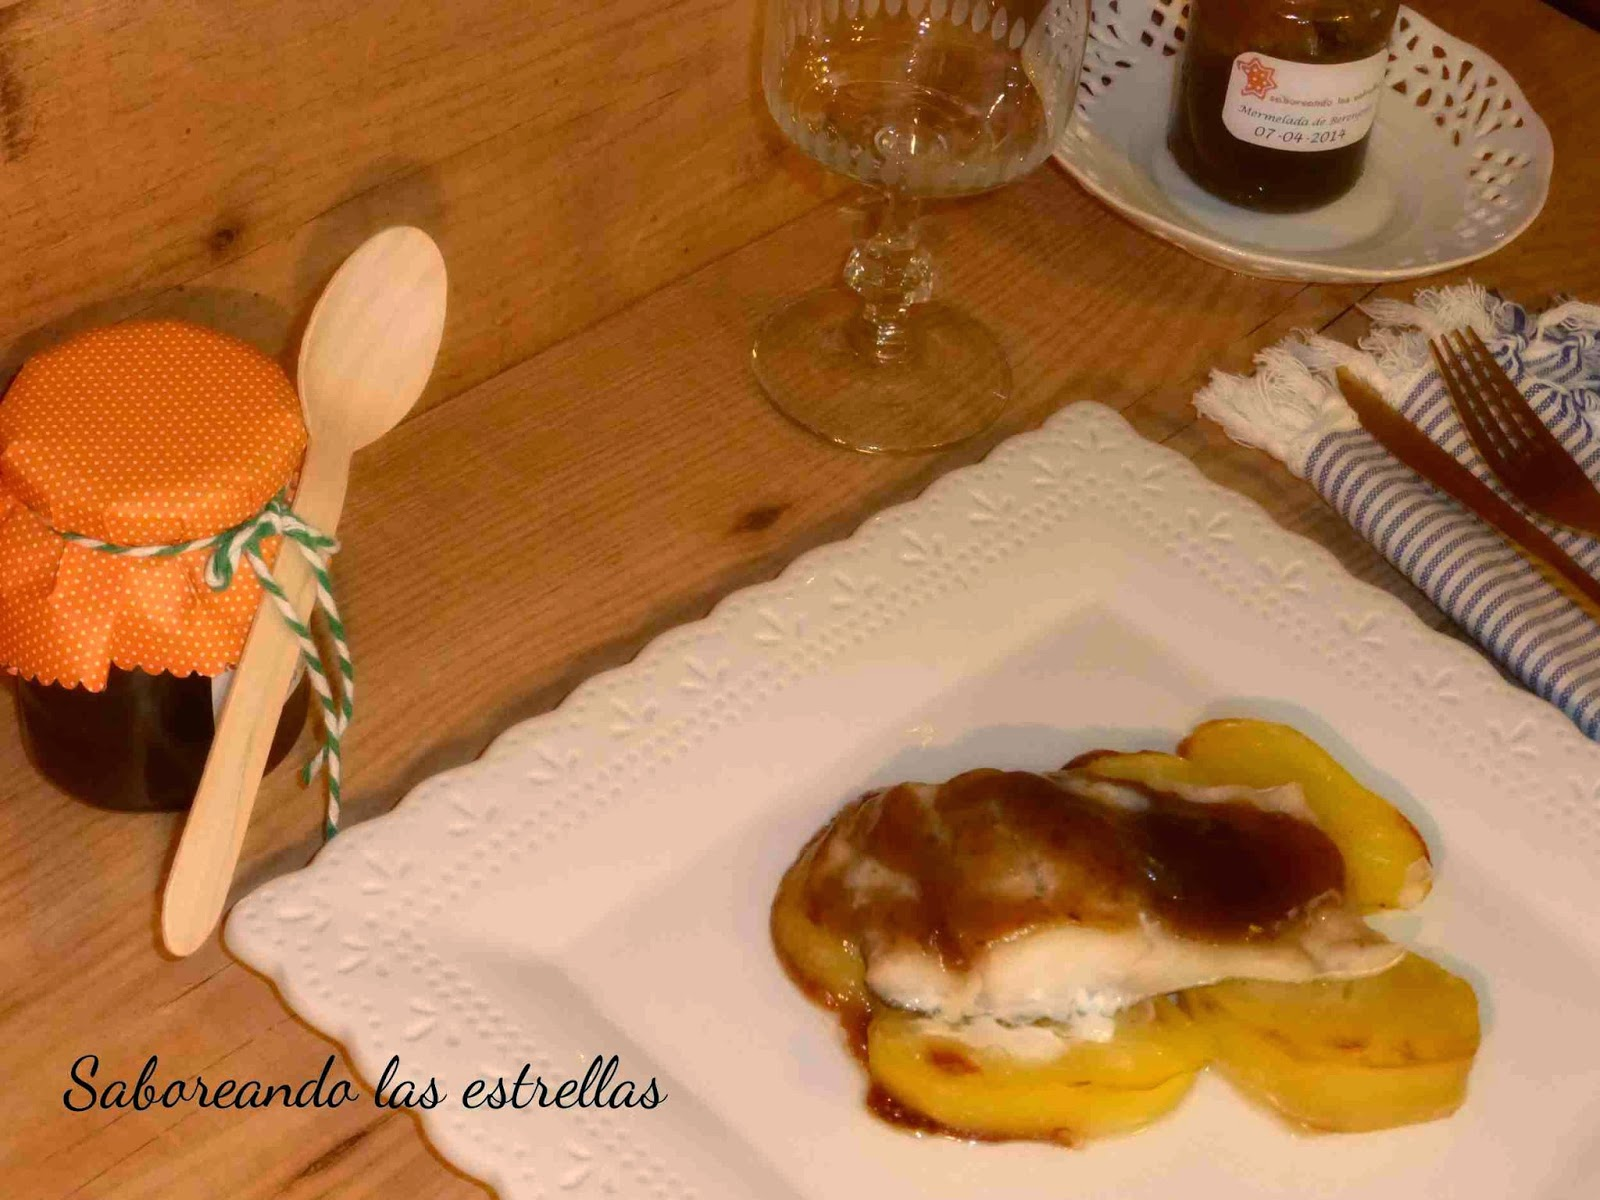 Bacalao gratinado con mermelada de berenjenas